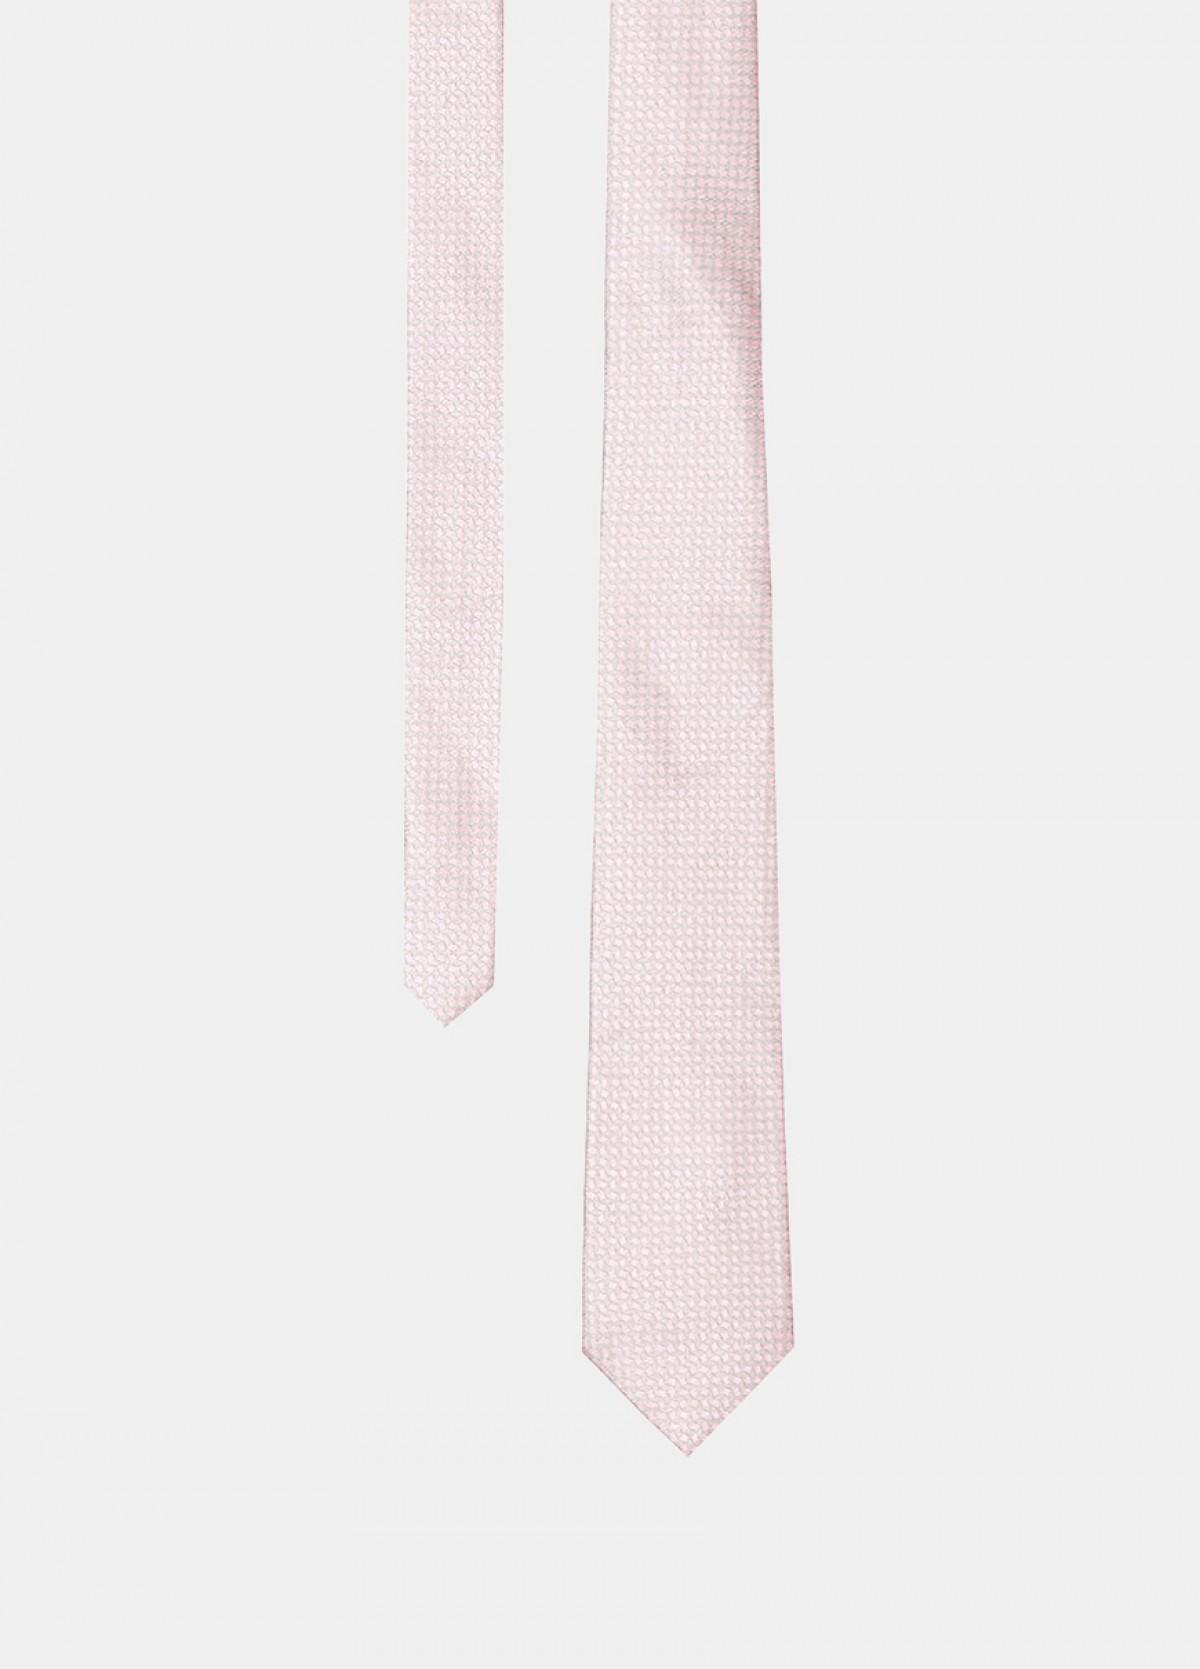 The Wine Stain Resistant Tie